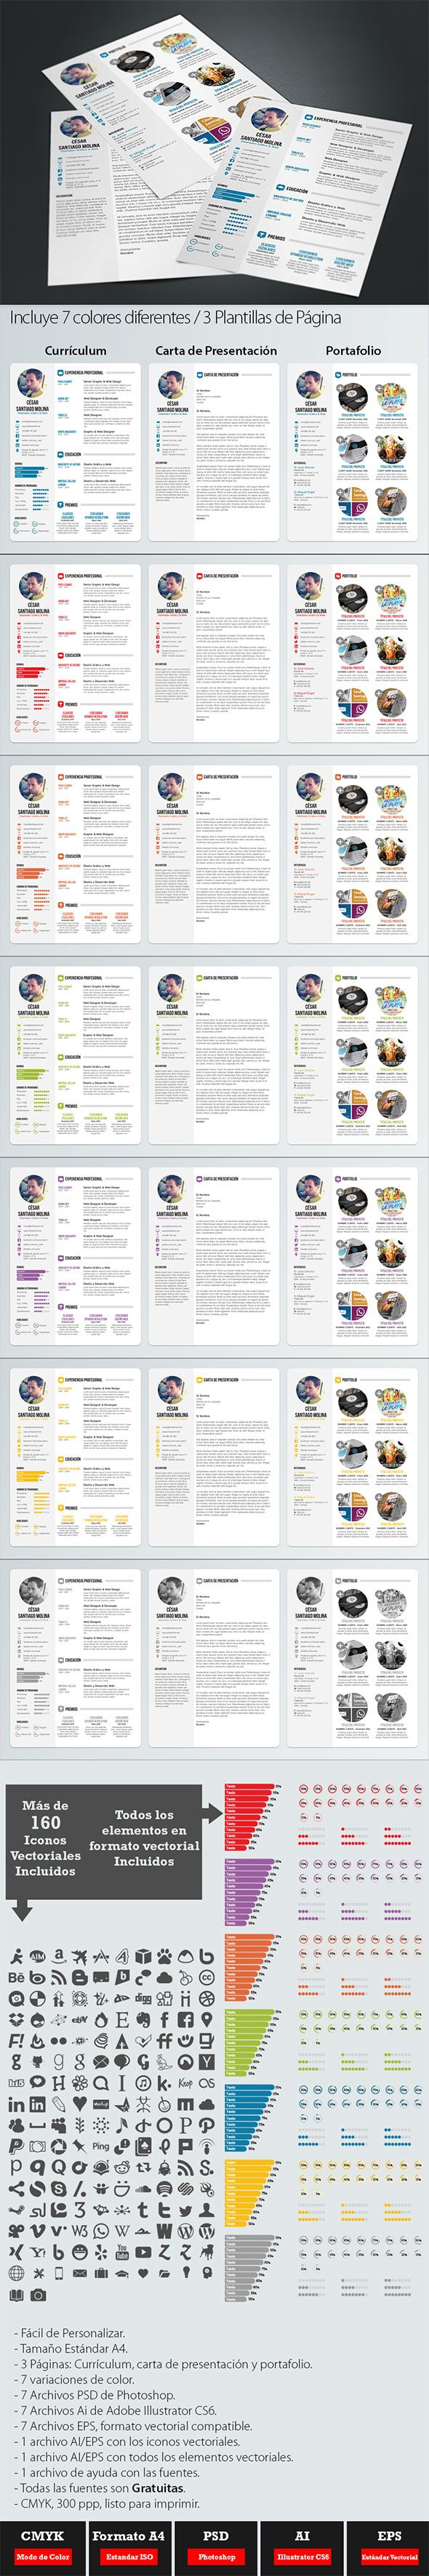 Cv And Resume Templates%0A Plantillas de Curr  culum Vitae  Curr  culum Vitae Profesional en   Colores   Creative CvResume DesignSuccessResume TemplatesCreative